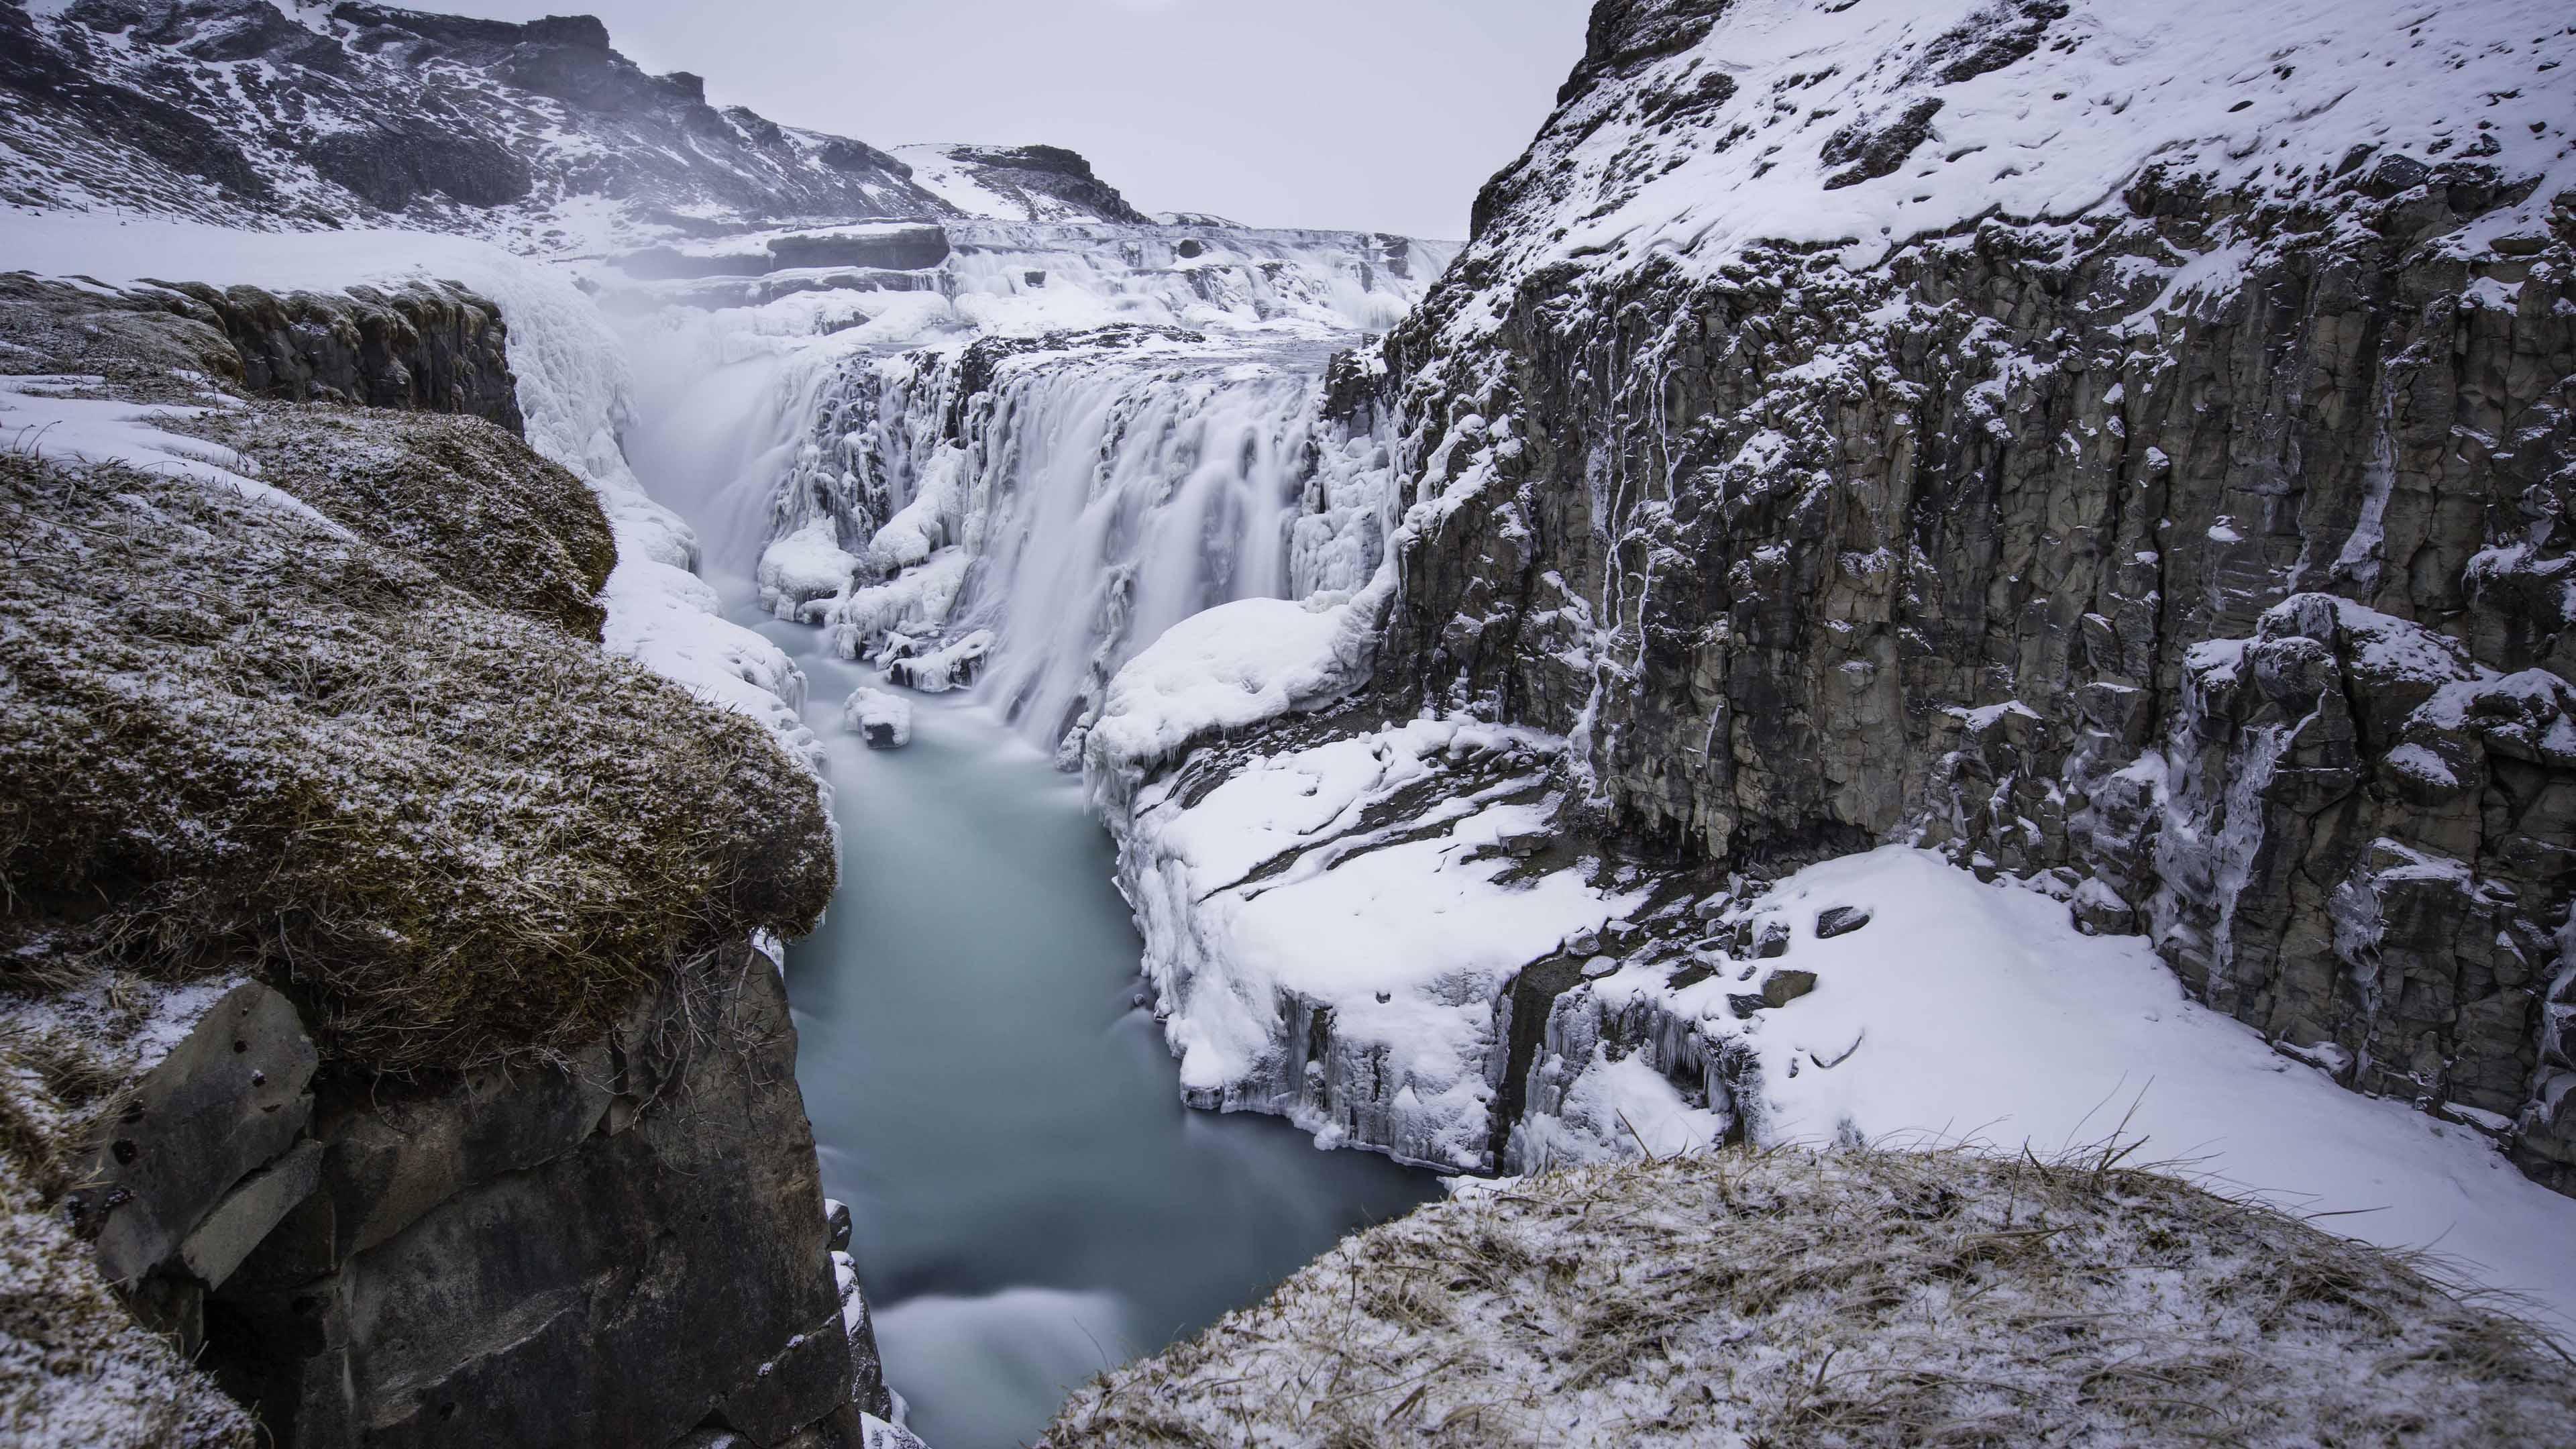 iceland 4k wallpaper - photo #22